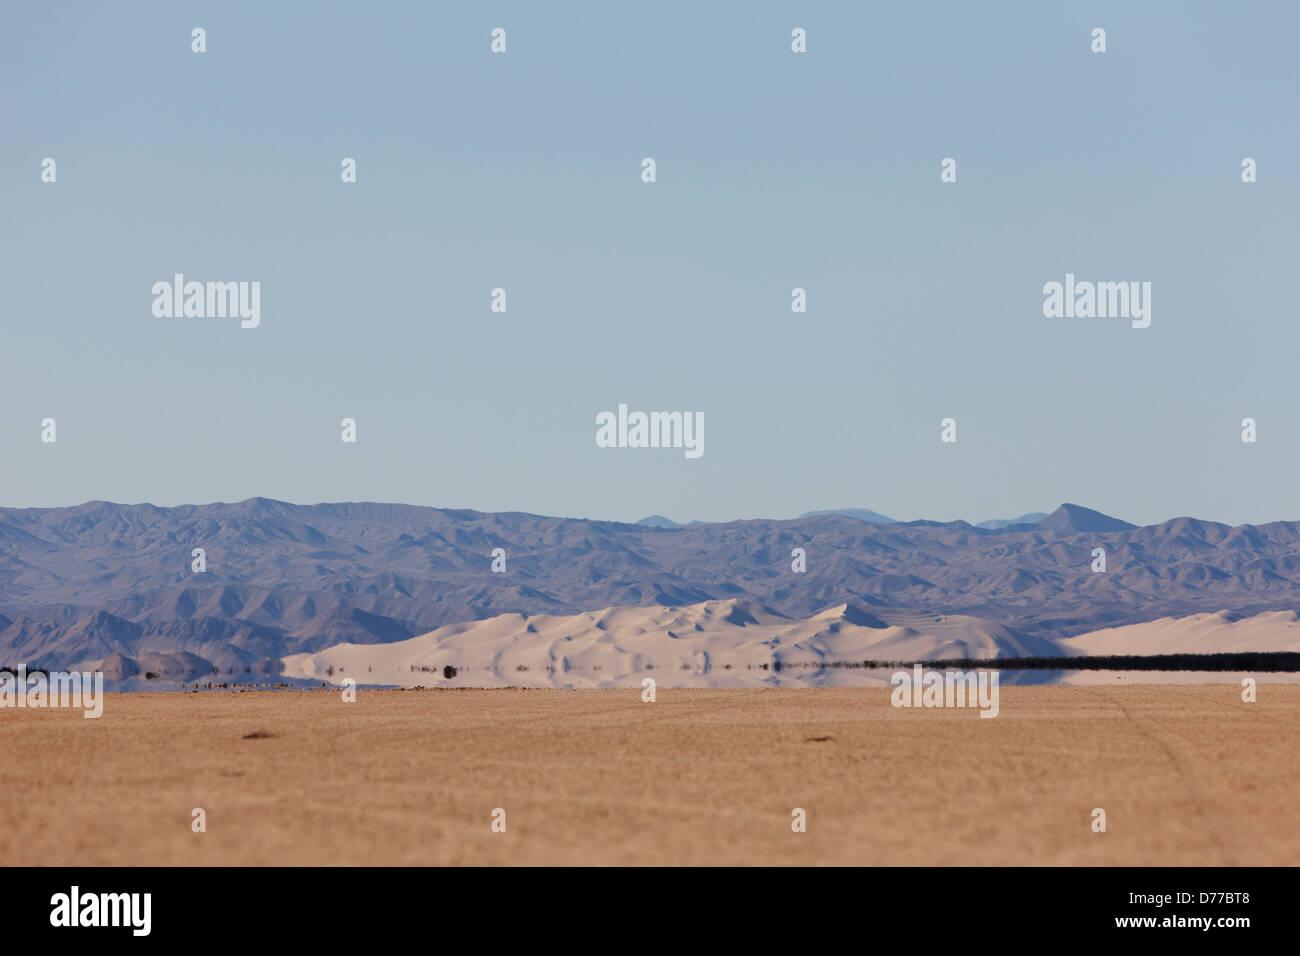 Sand Dunes Inferior Mirage - Stock Image